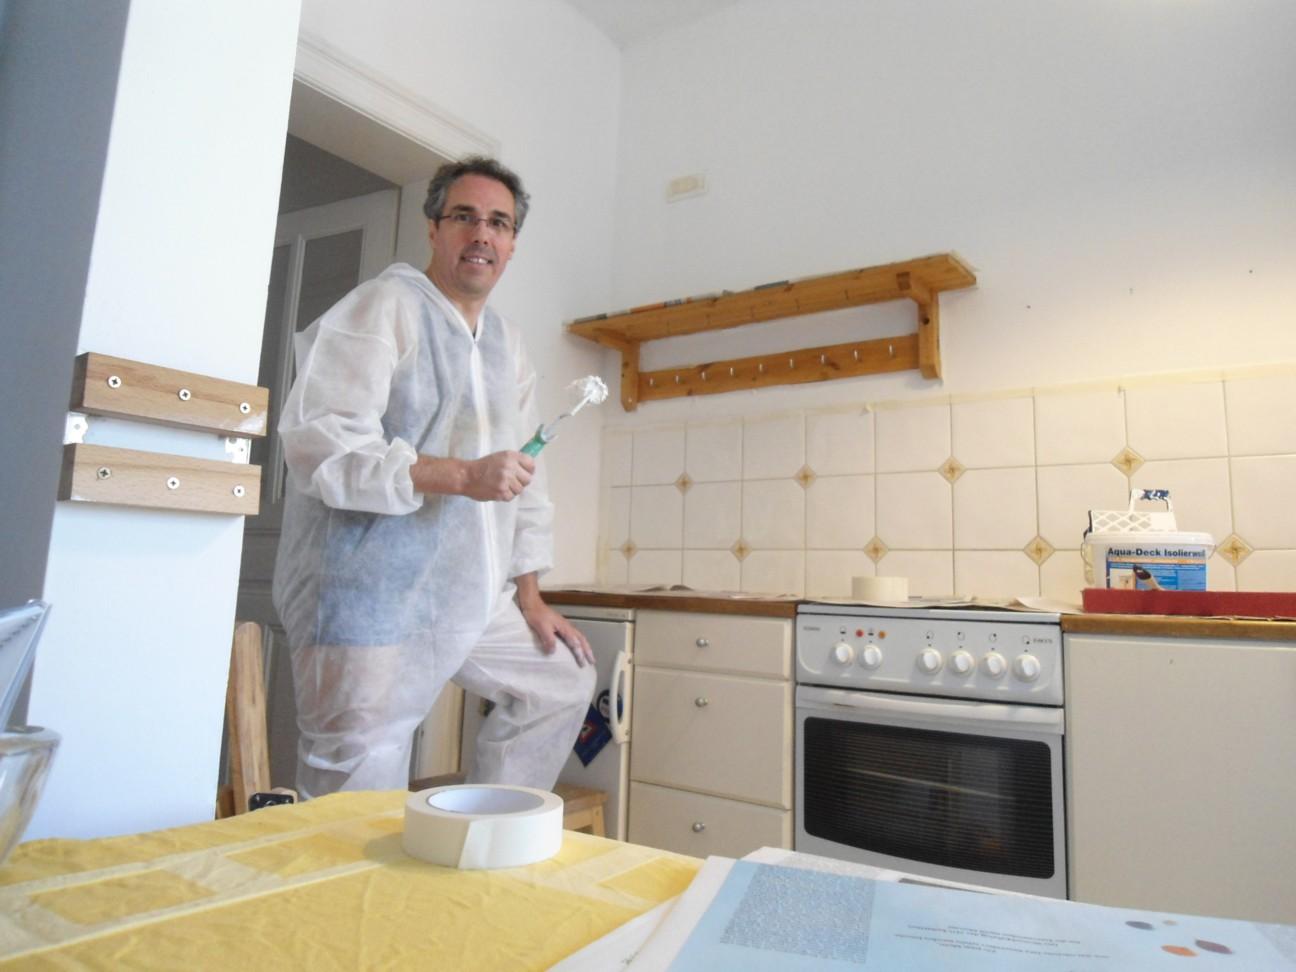 Como limpiar mi casa dise os arquitect nicos - Como limpiar la casa ...